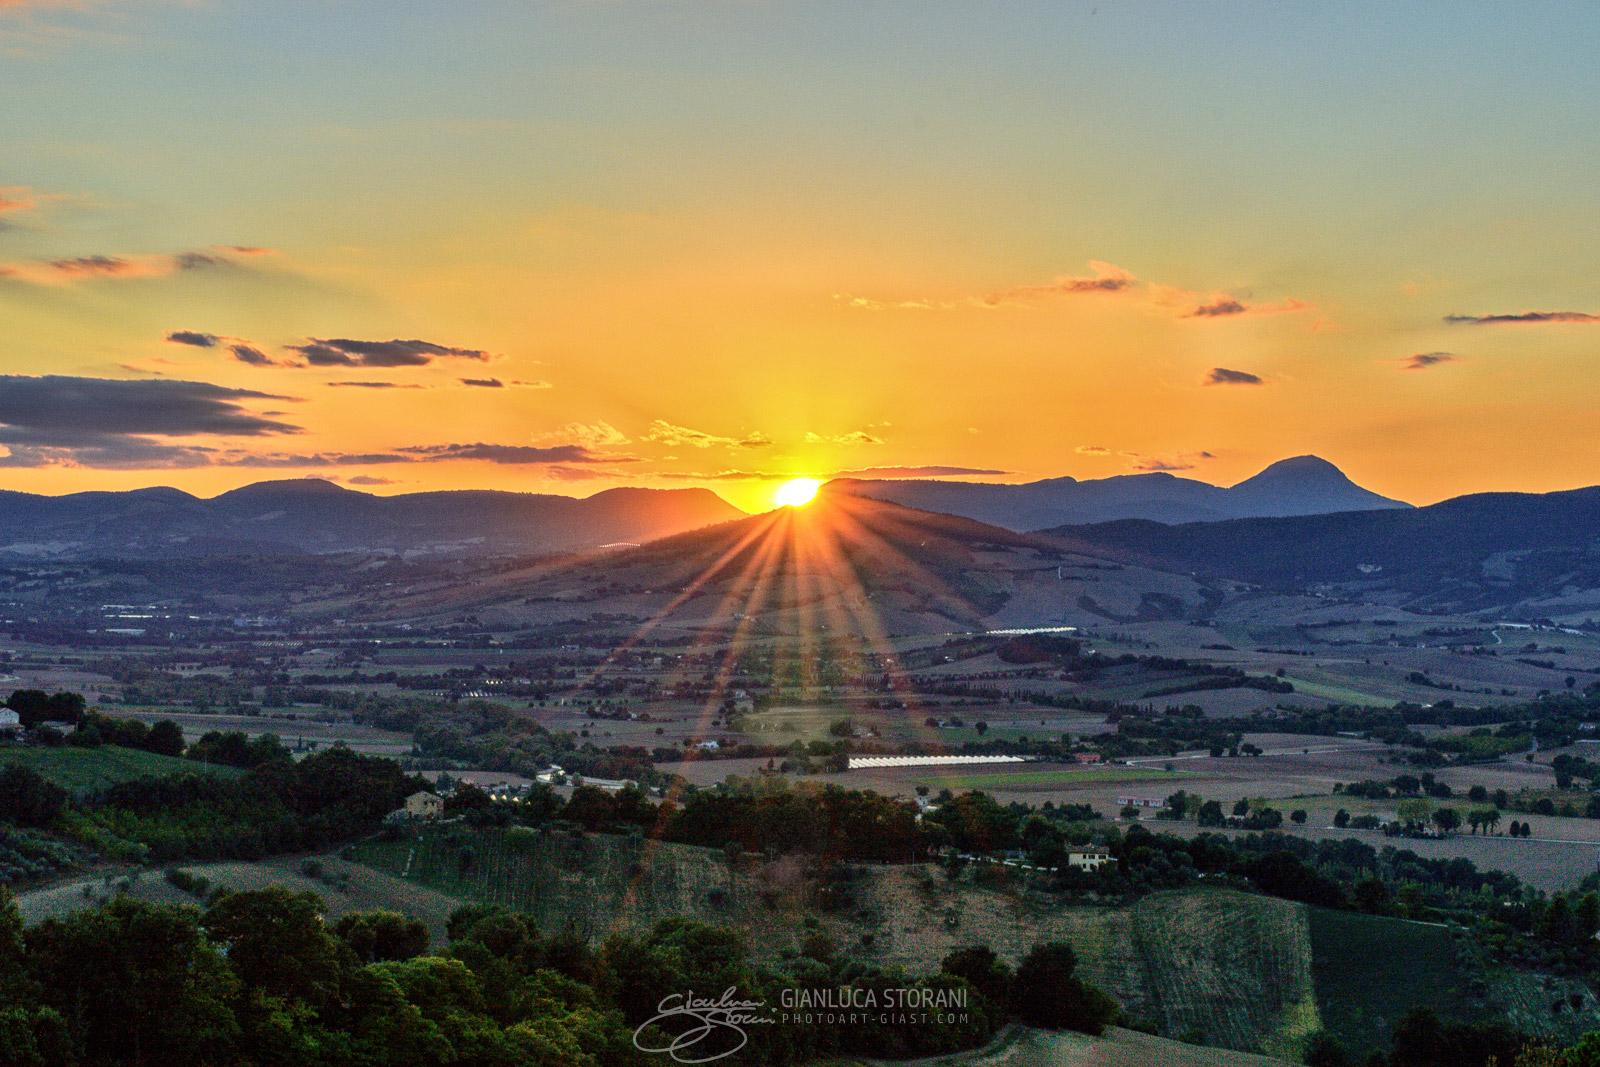 Tramonto su Pitino - Gianluca Storani Photo Art (ID: 1-6240)